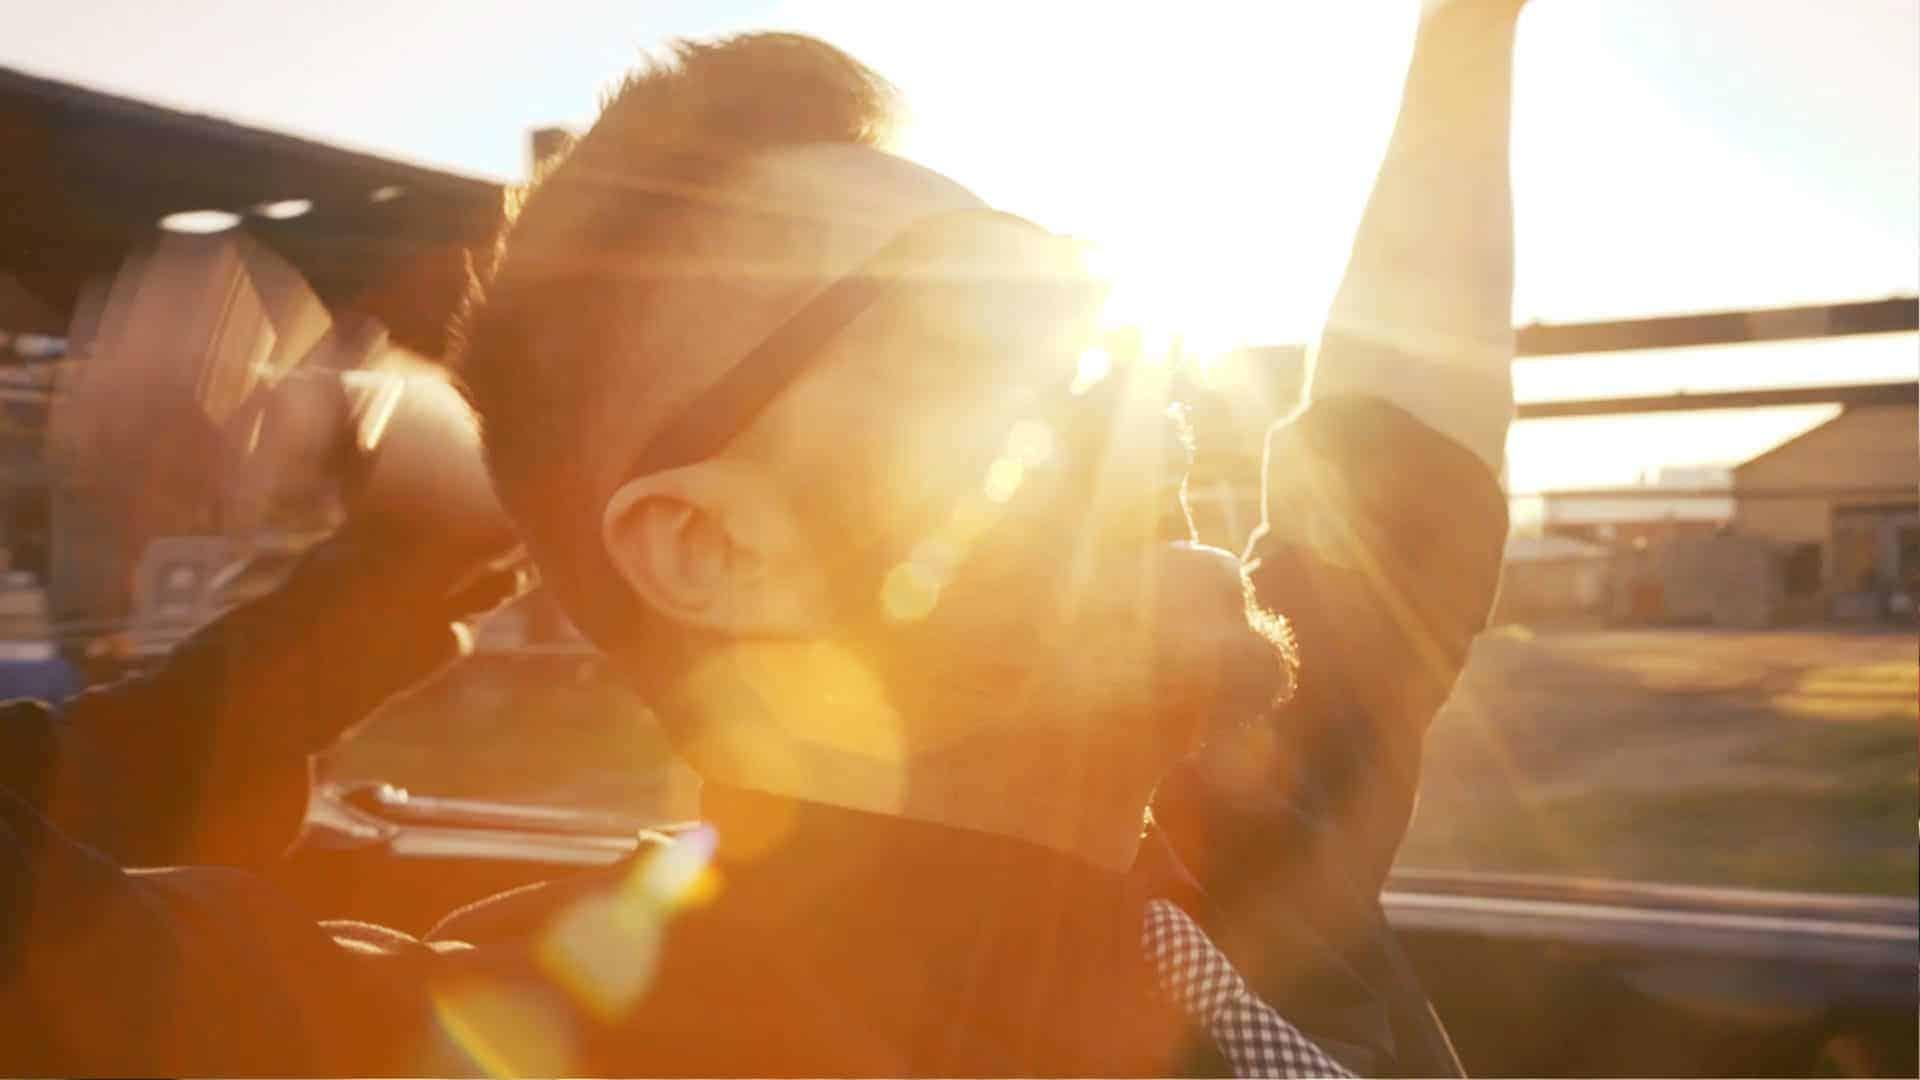 roka hueka still from music video